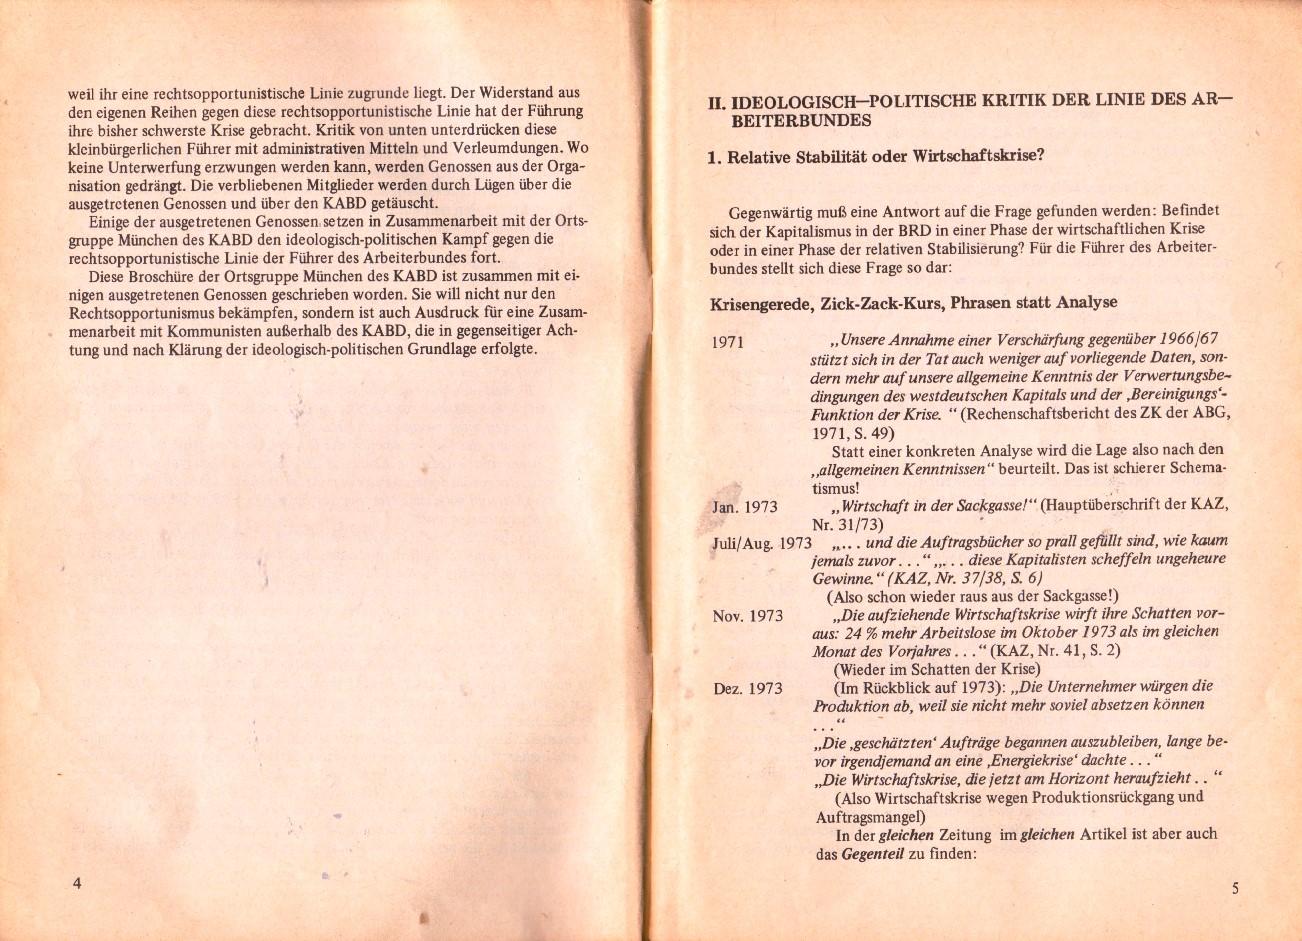 Muenchen_KABD_1974_Kritik_des_AB_04